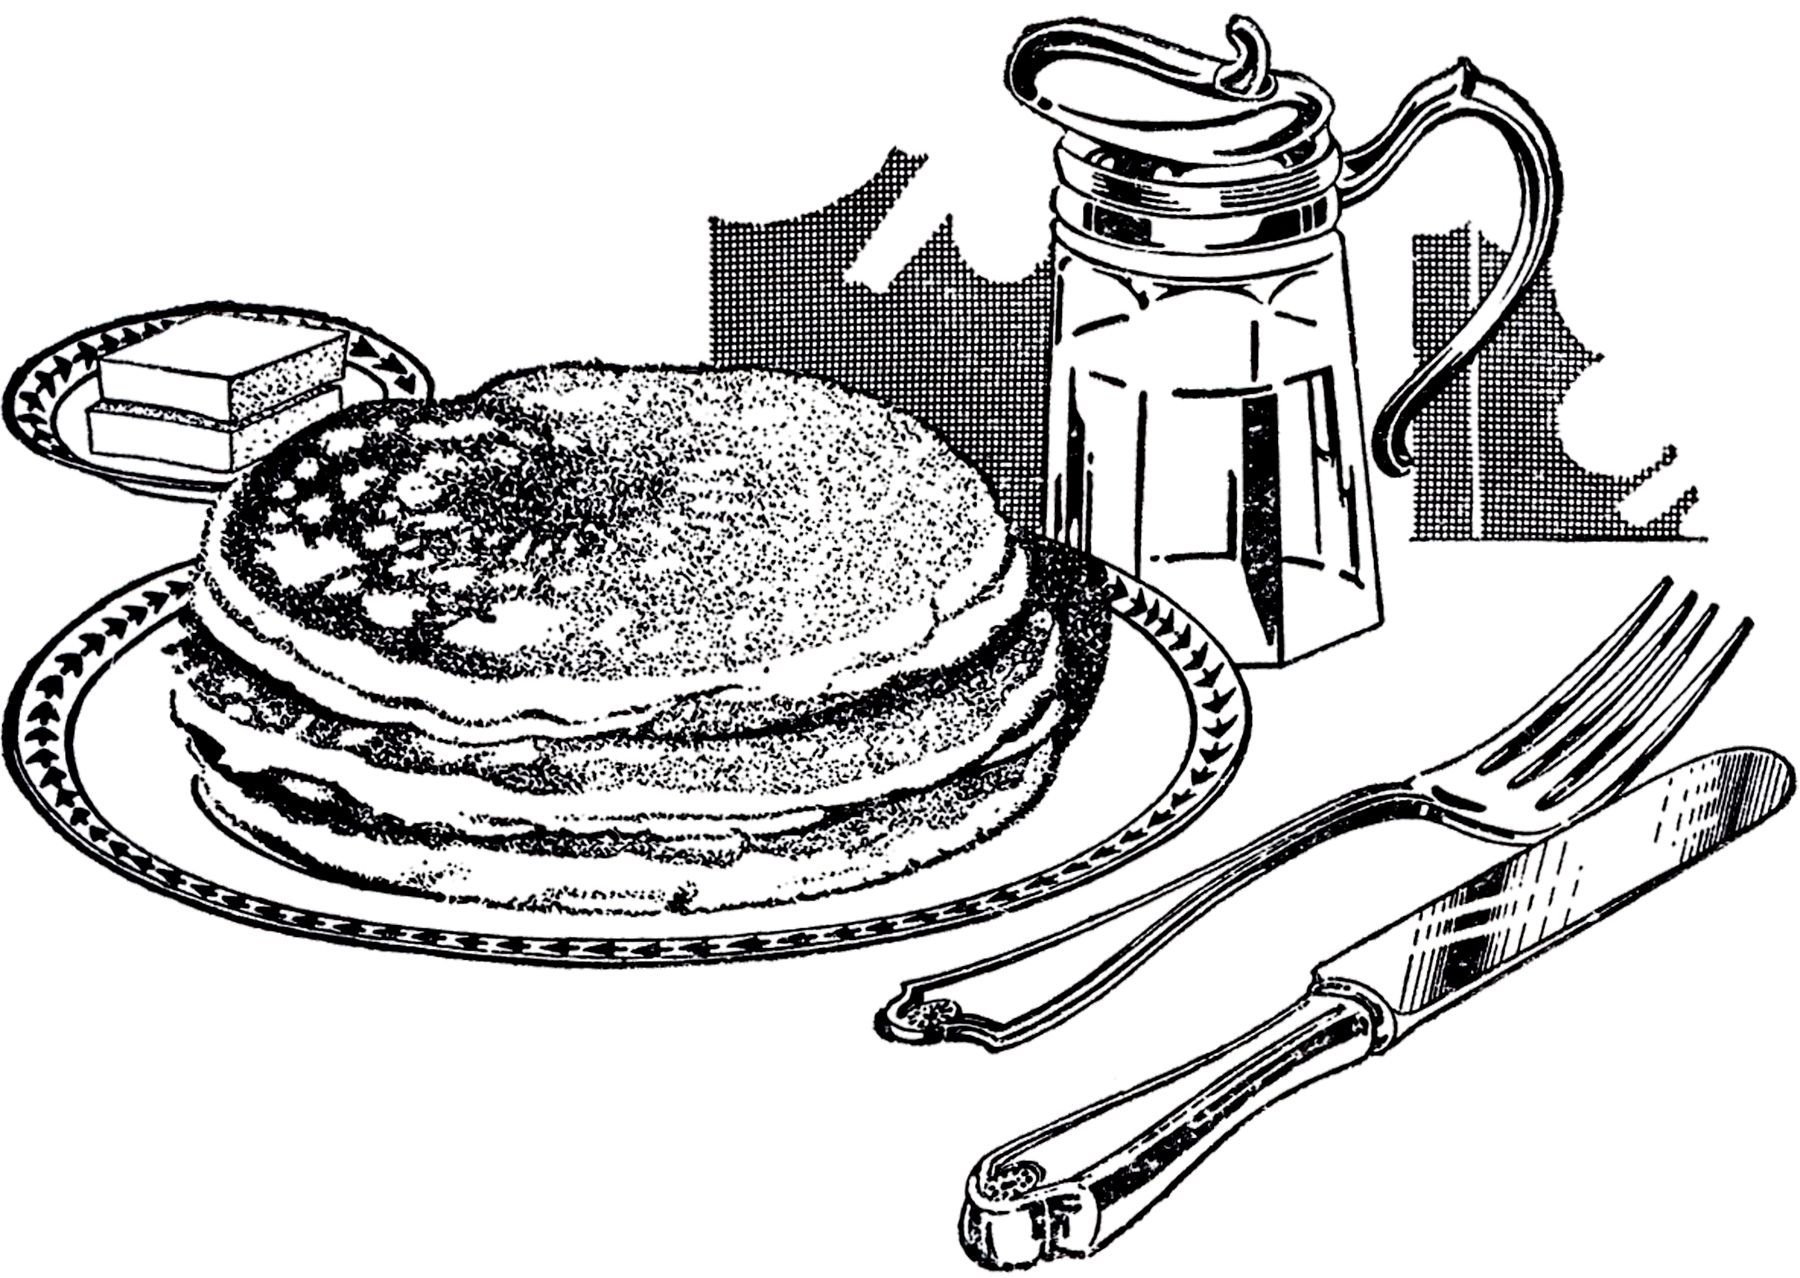 medium resolution of thegraphicsfairy com wp content uploads 2015 04 vintage pancake breakfast image